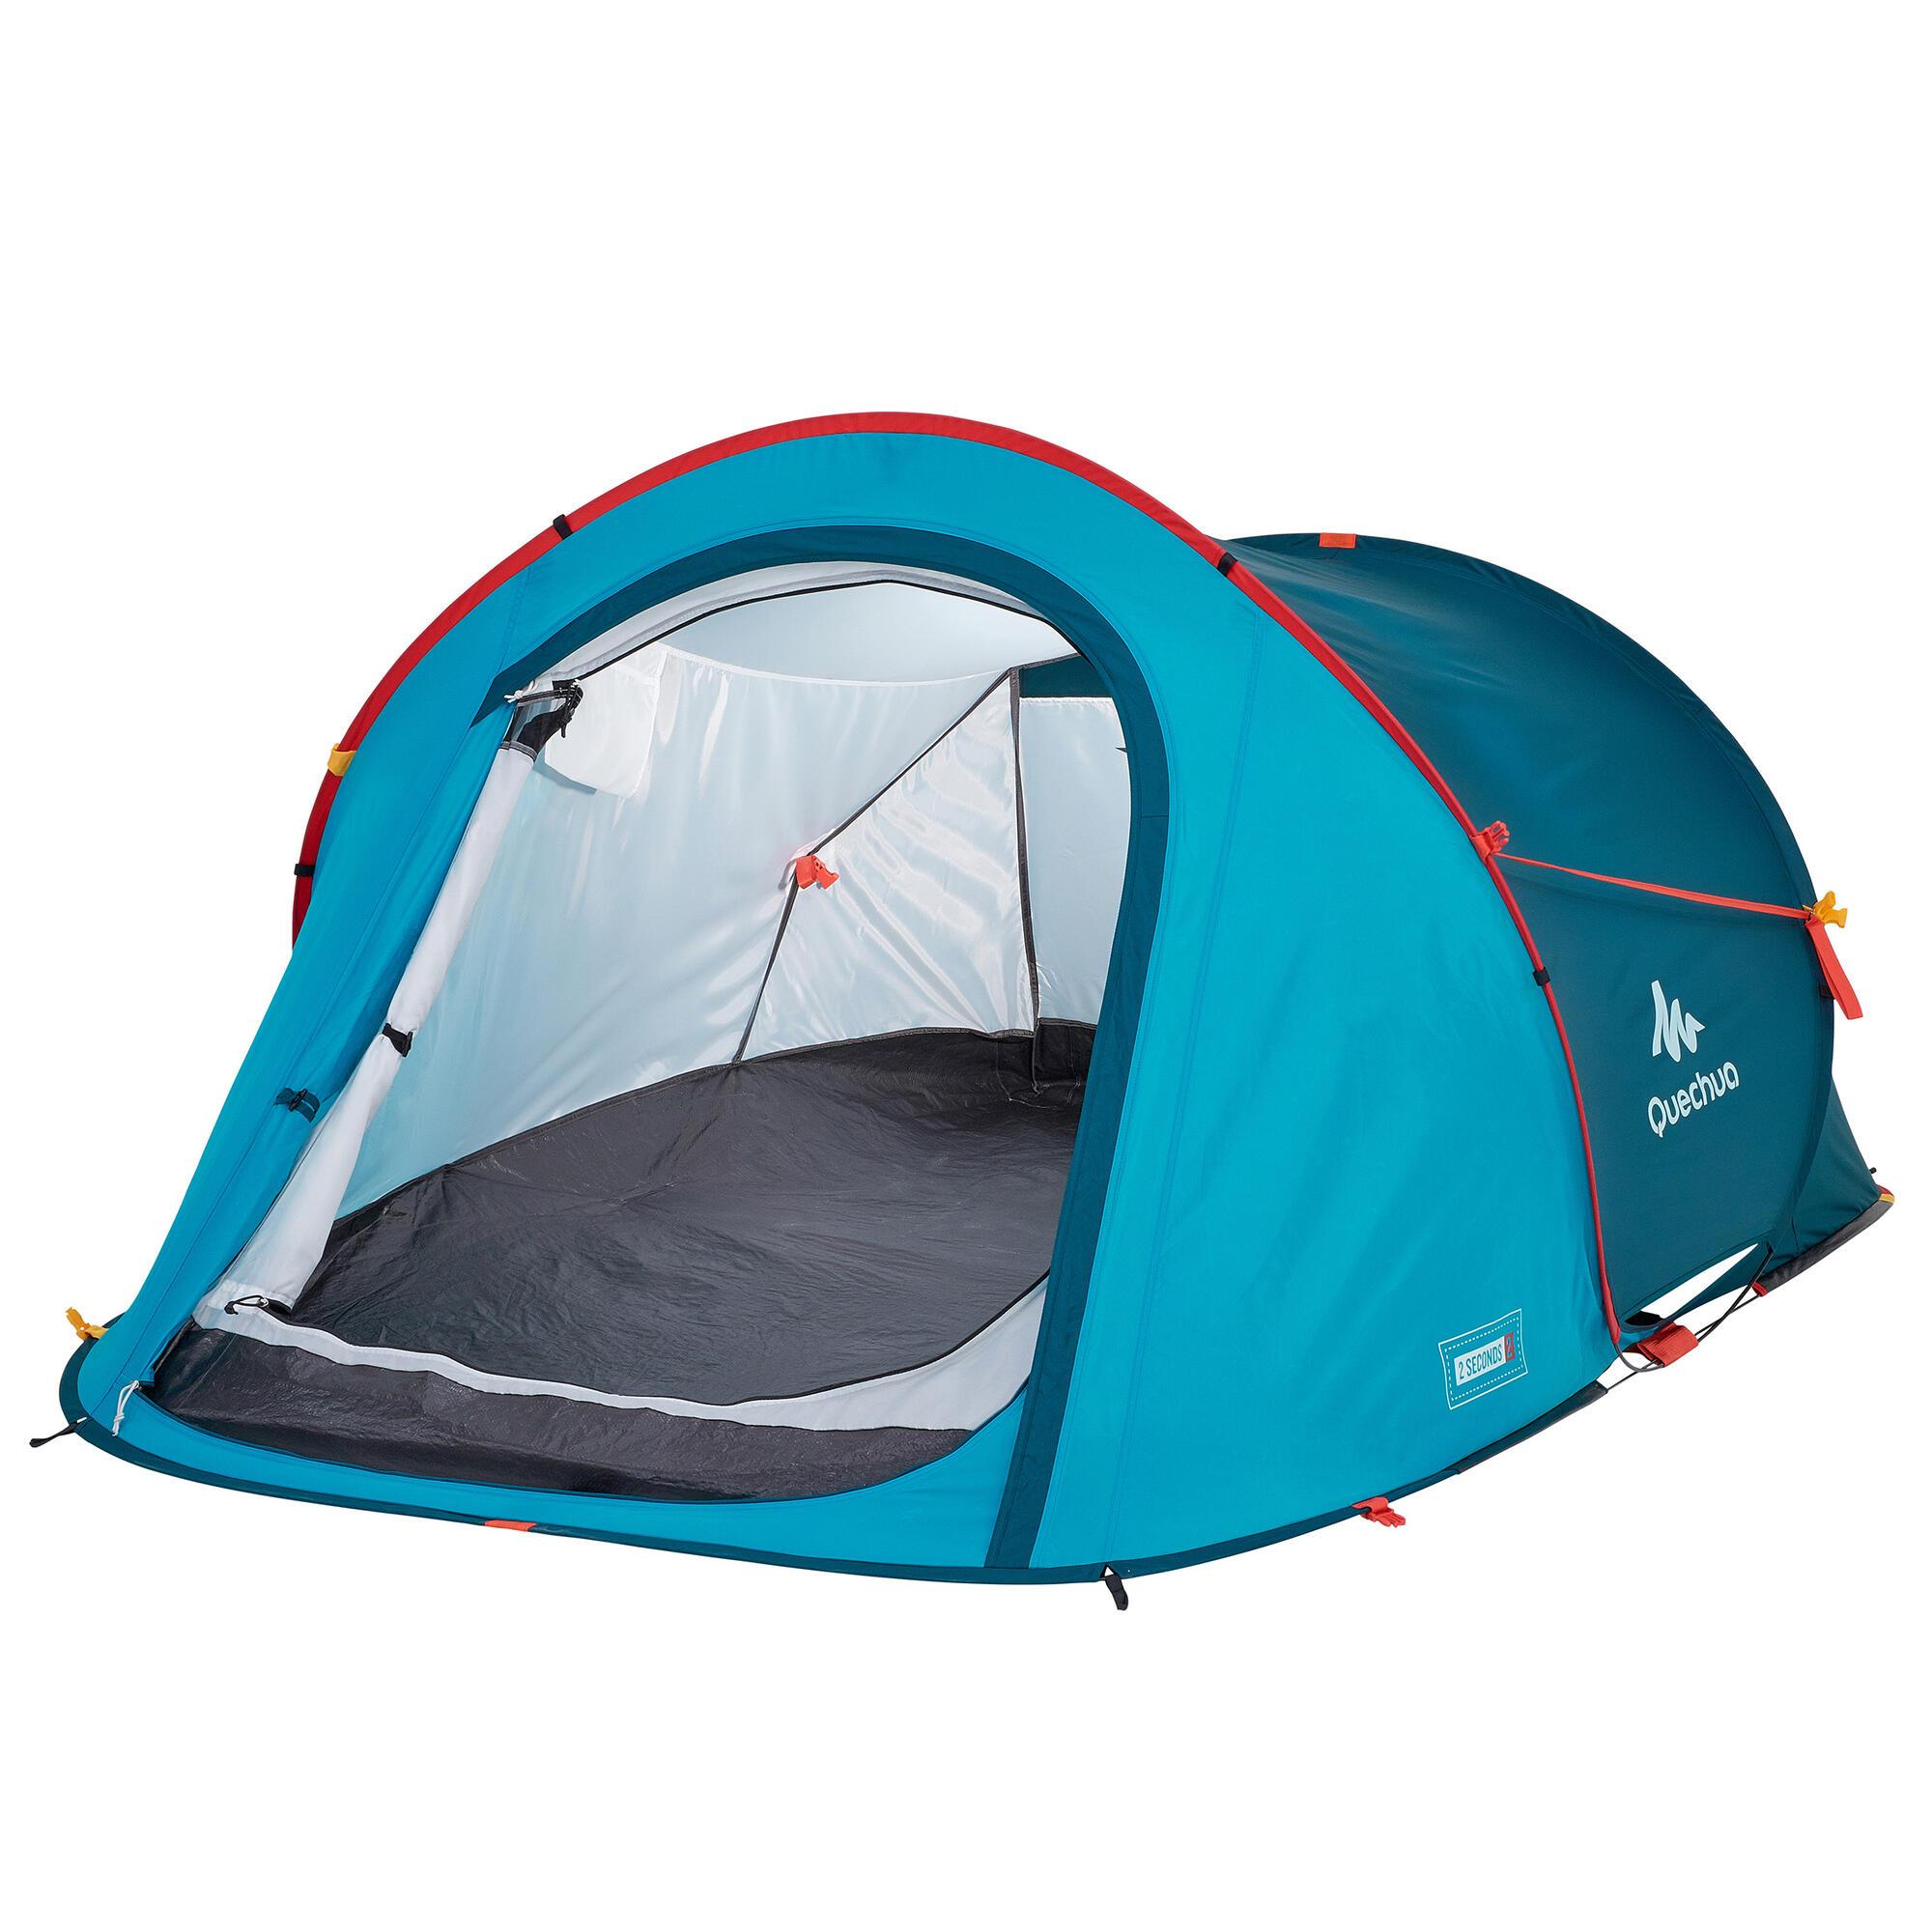 tente de camping 2 seconds 2 personnes bleu p trole quechua. Black Bedroom Furniture Sets. Home Design Ideas